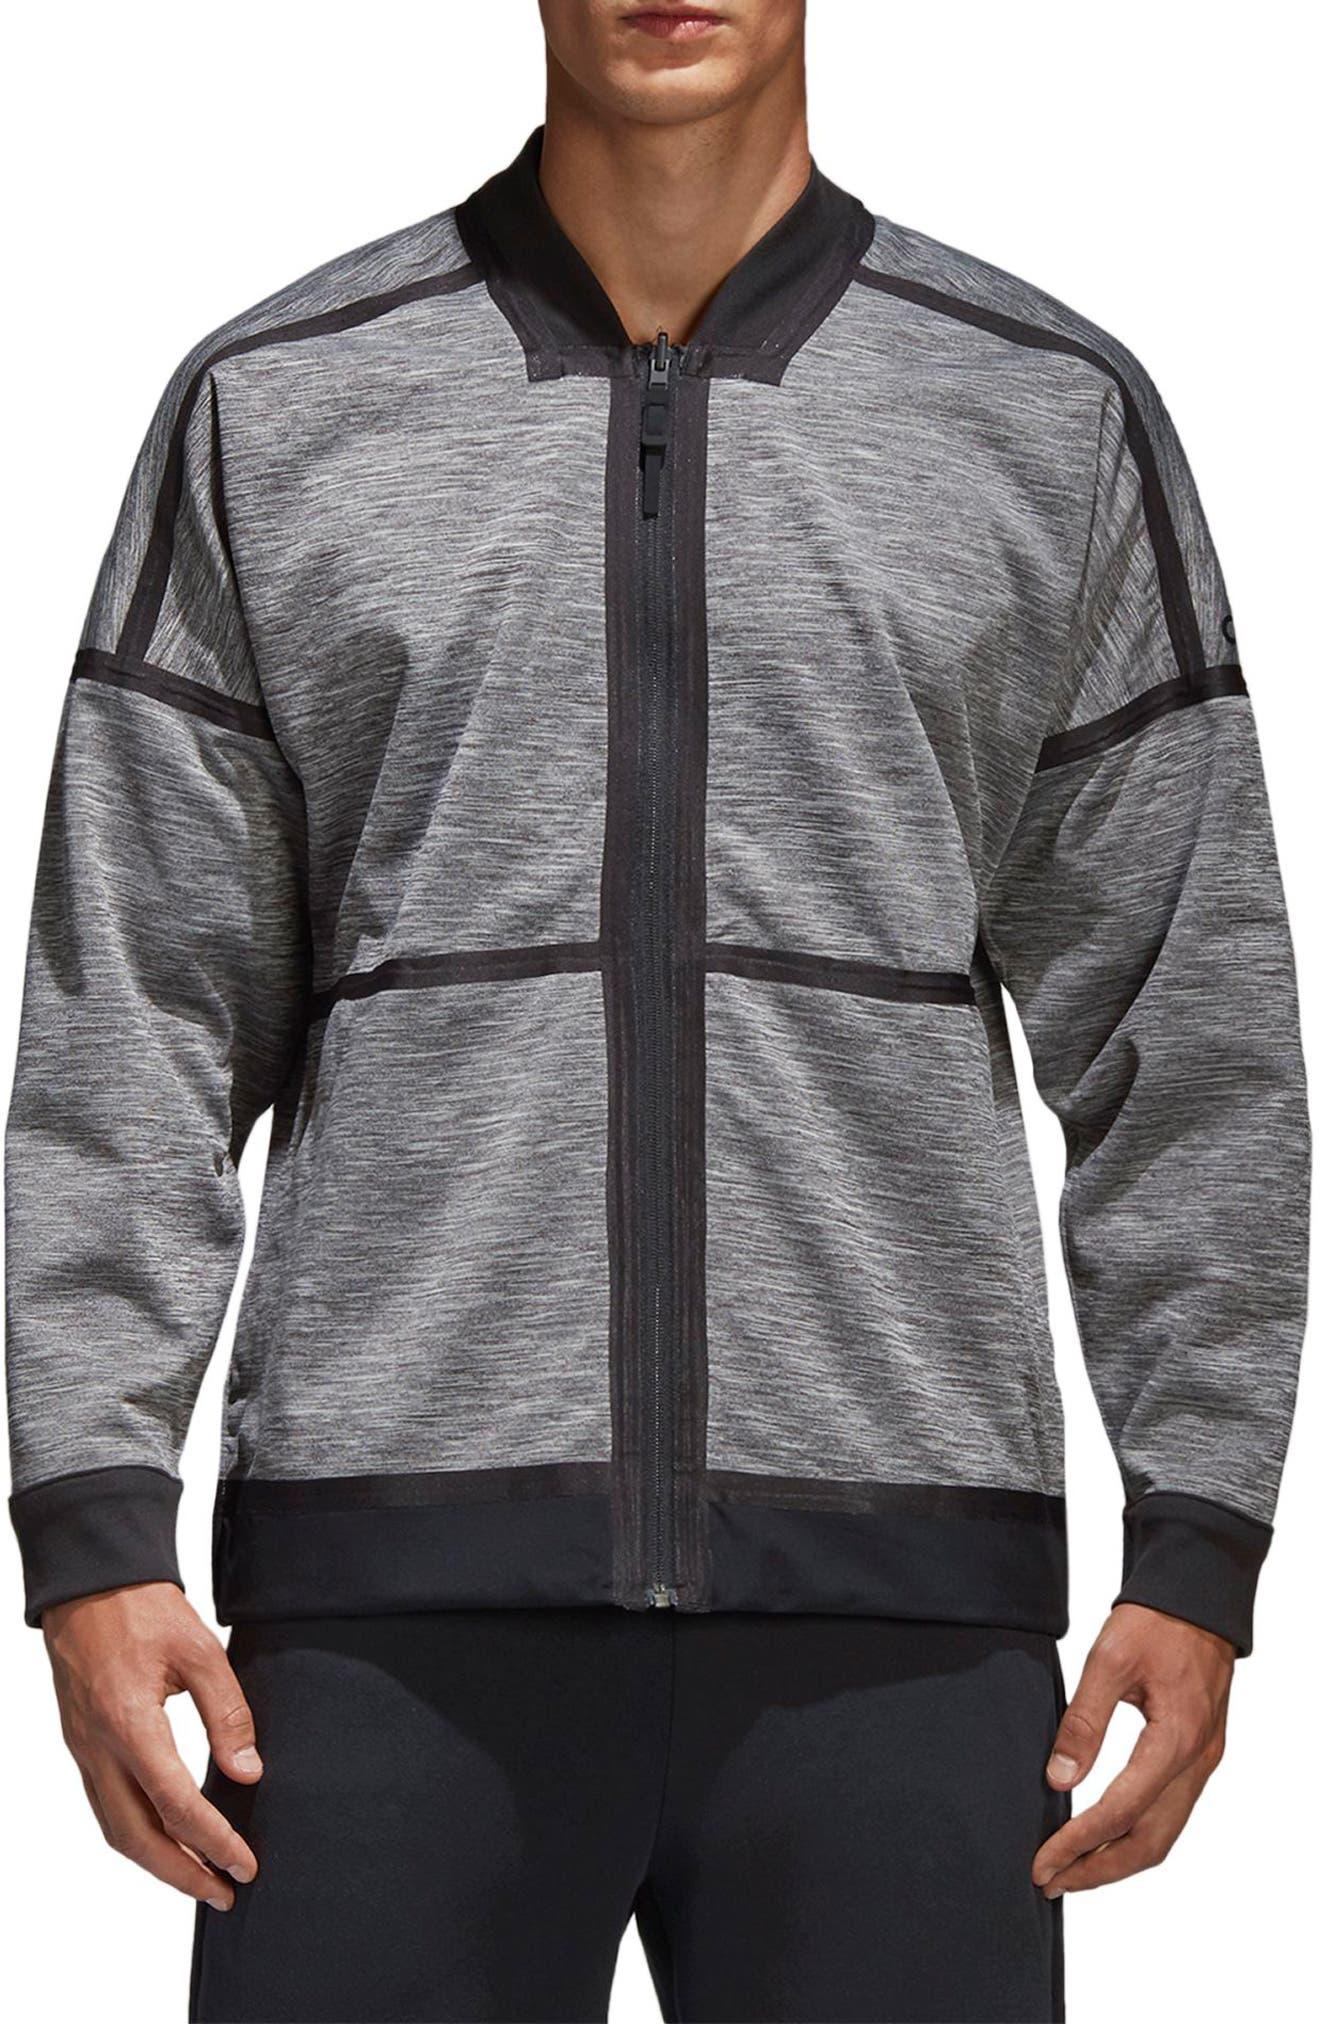 Z.N.E. Reversible Ventilated Jacket,                             Main thumbnail 1, color,                             Black / Storm Heather/ Mgh